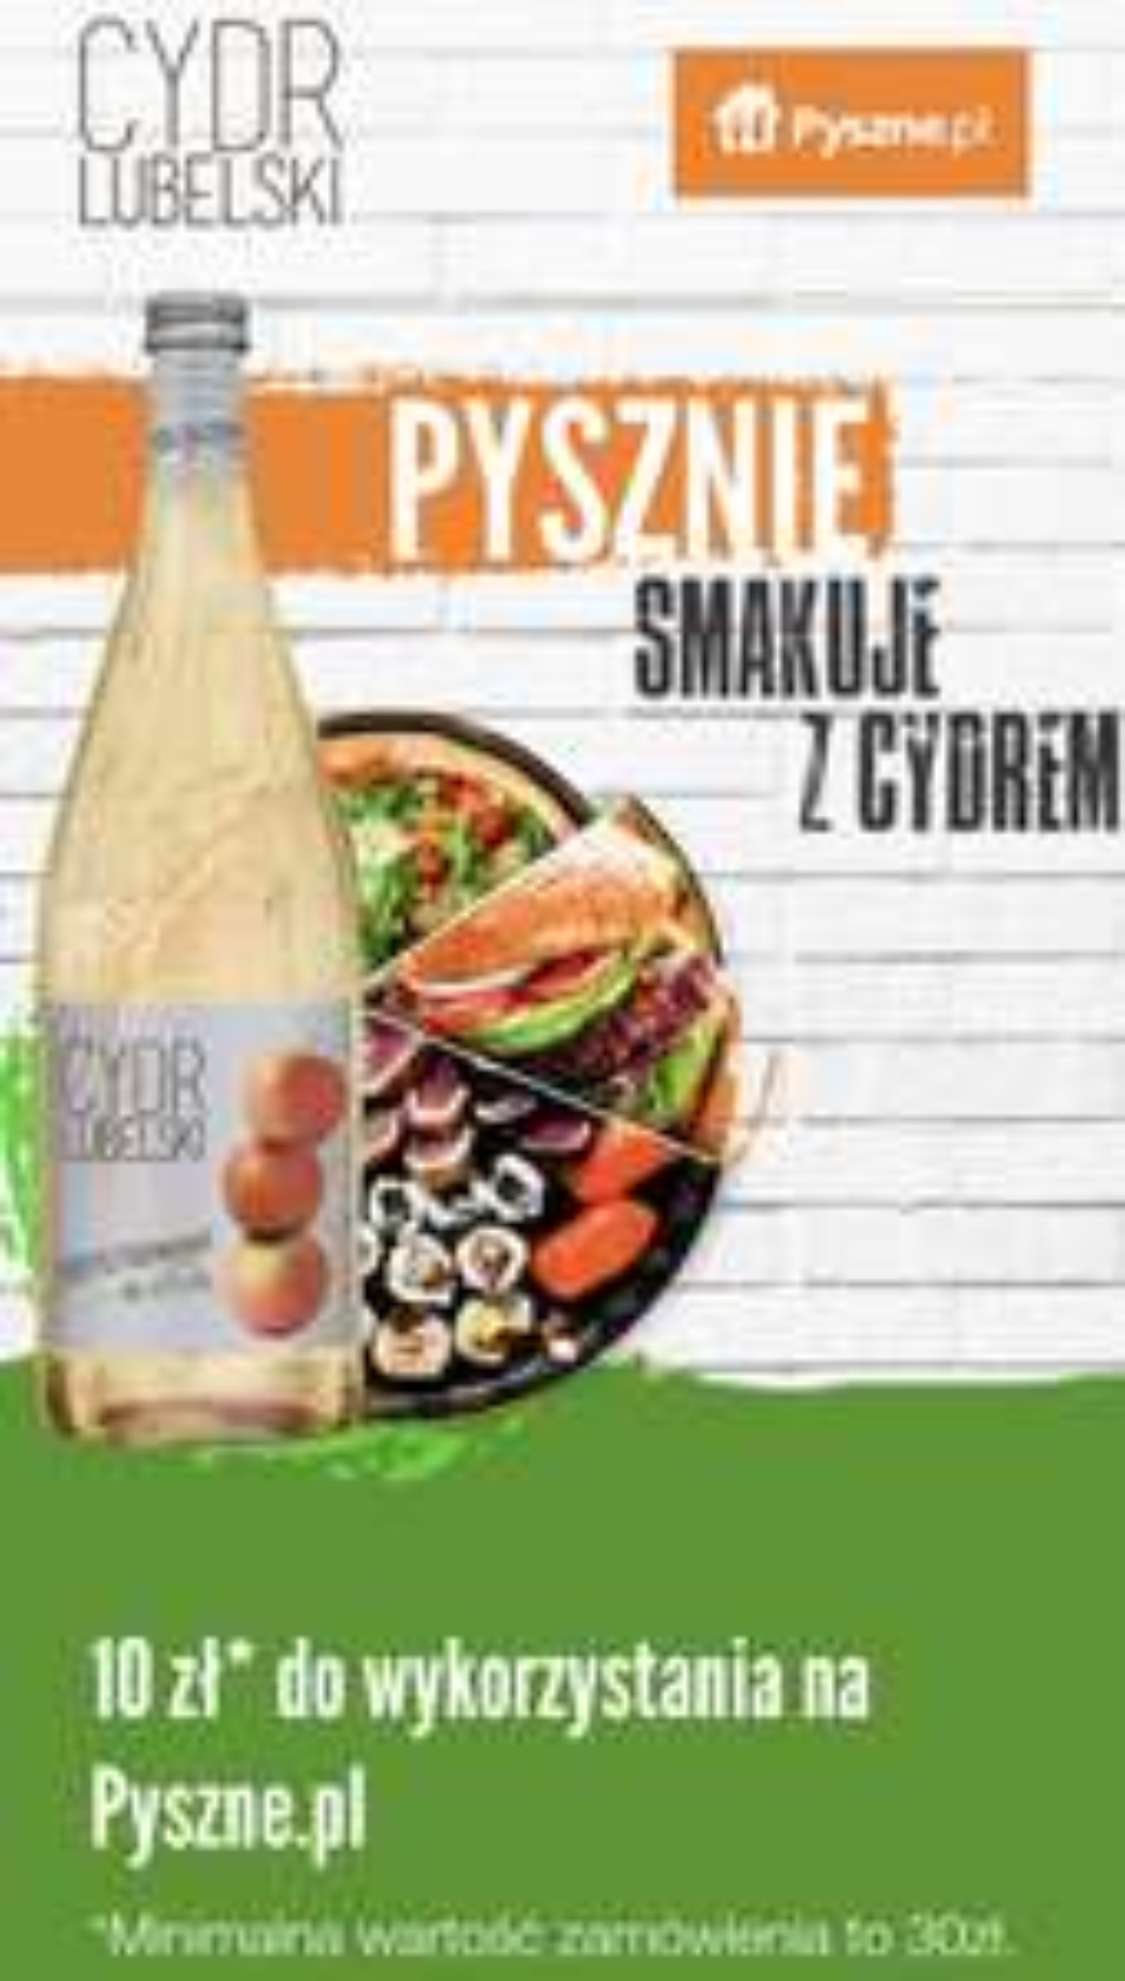 Pyszne.pl rabat 10 pln za cydr lubelski pysznezcydrem.pl